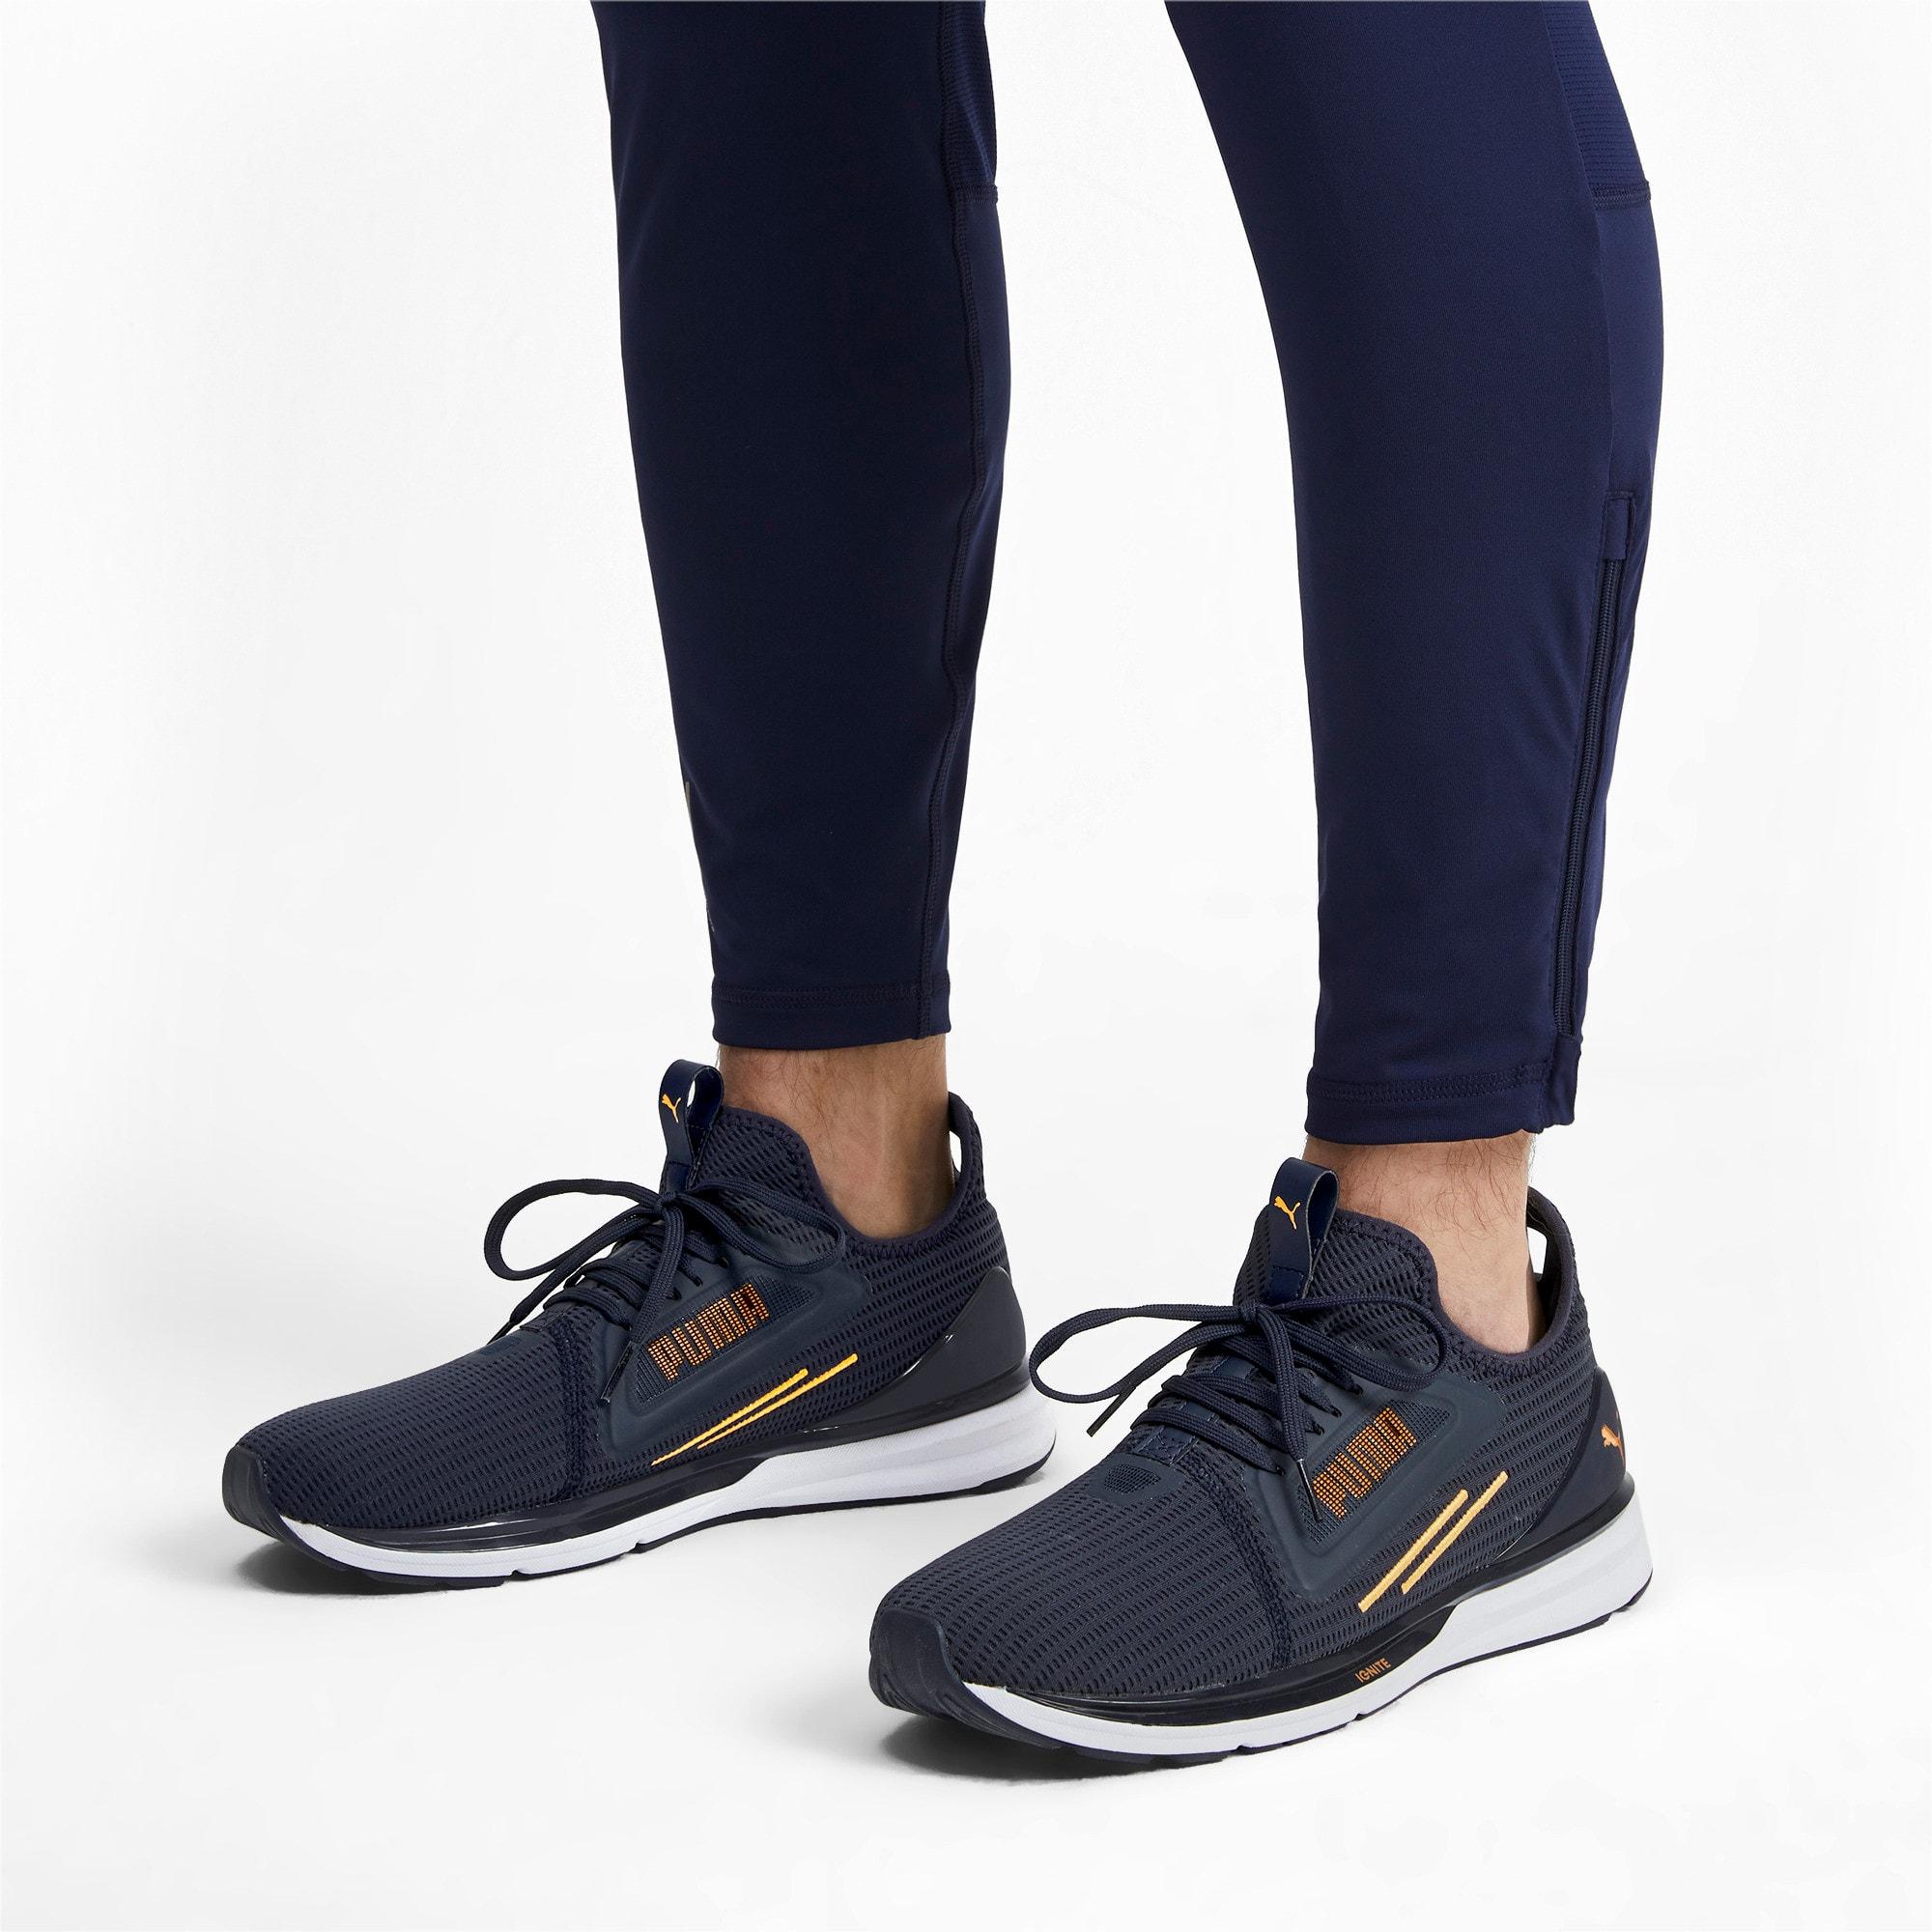 Thumbnail 2 of IGNITE Limitless Lean Running Shoes, Peacoat-Orange Alert, medium-IND